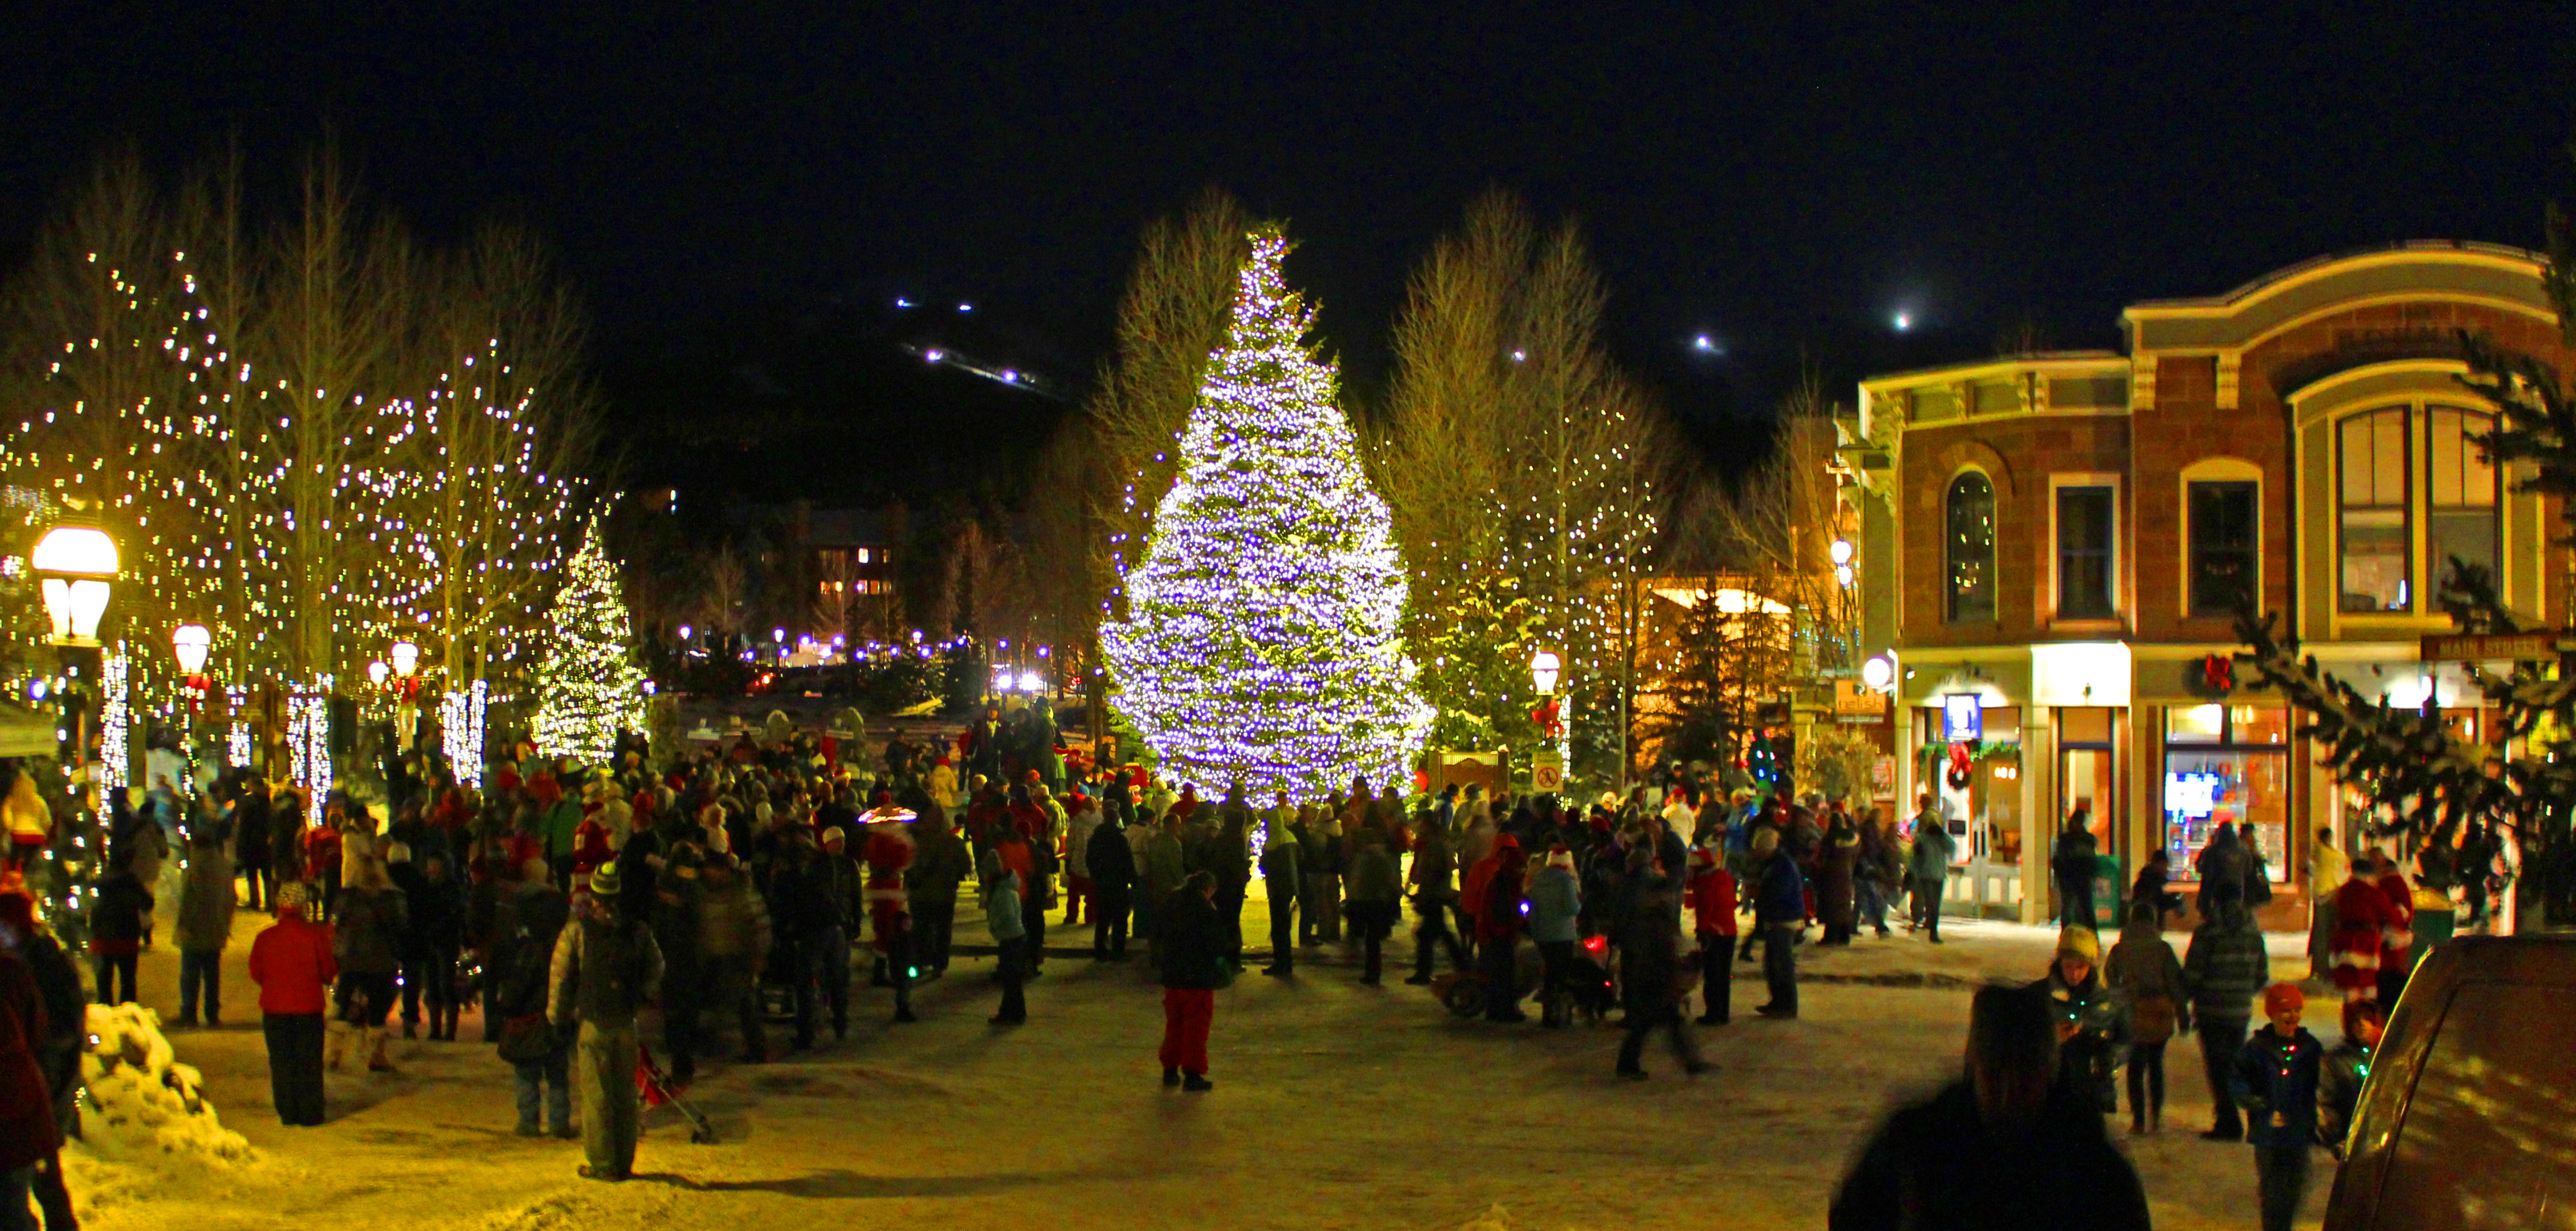 Breck's Lighting Ceremony